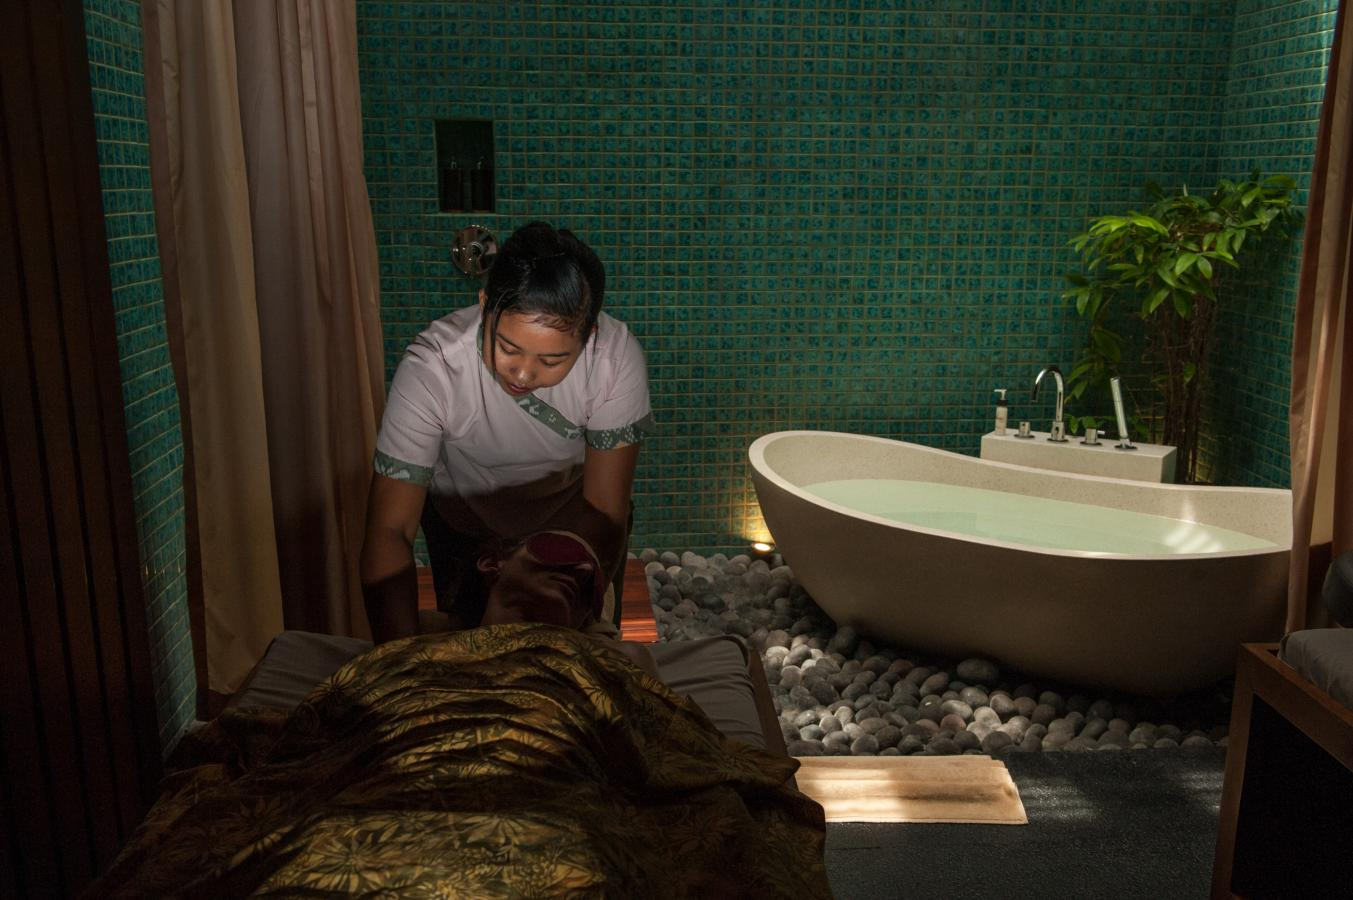 balinese-massage-with-chocolate-scrub-sanur-bali-2013